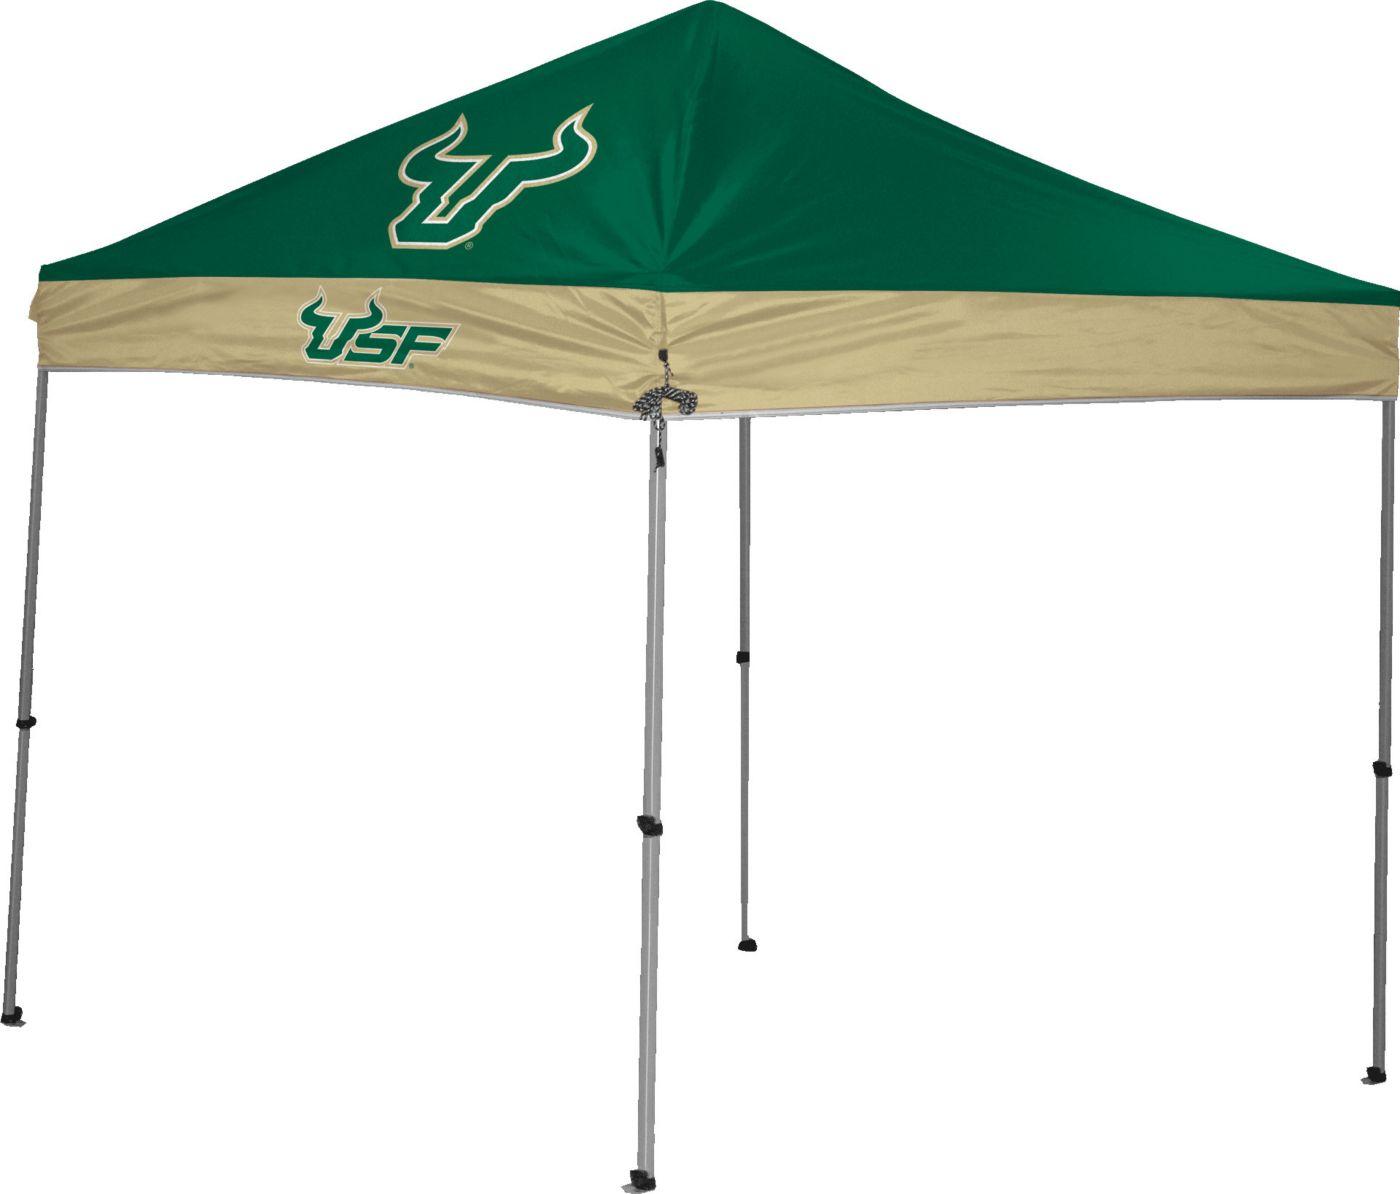 Rawlings South Florida Bulls 9' x 9' Sideline Canopy Tent